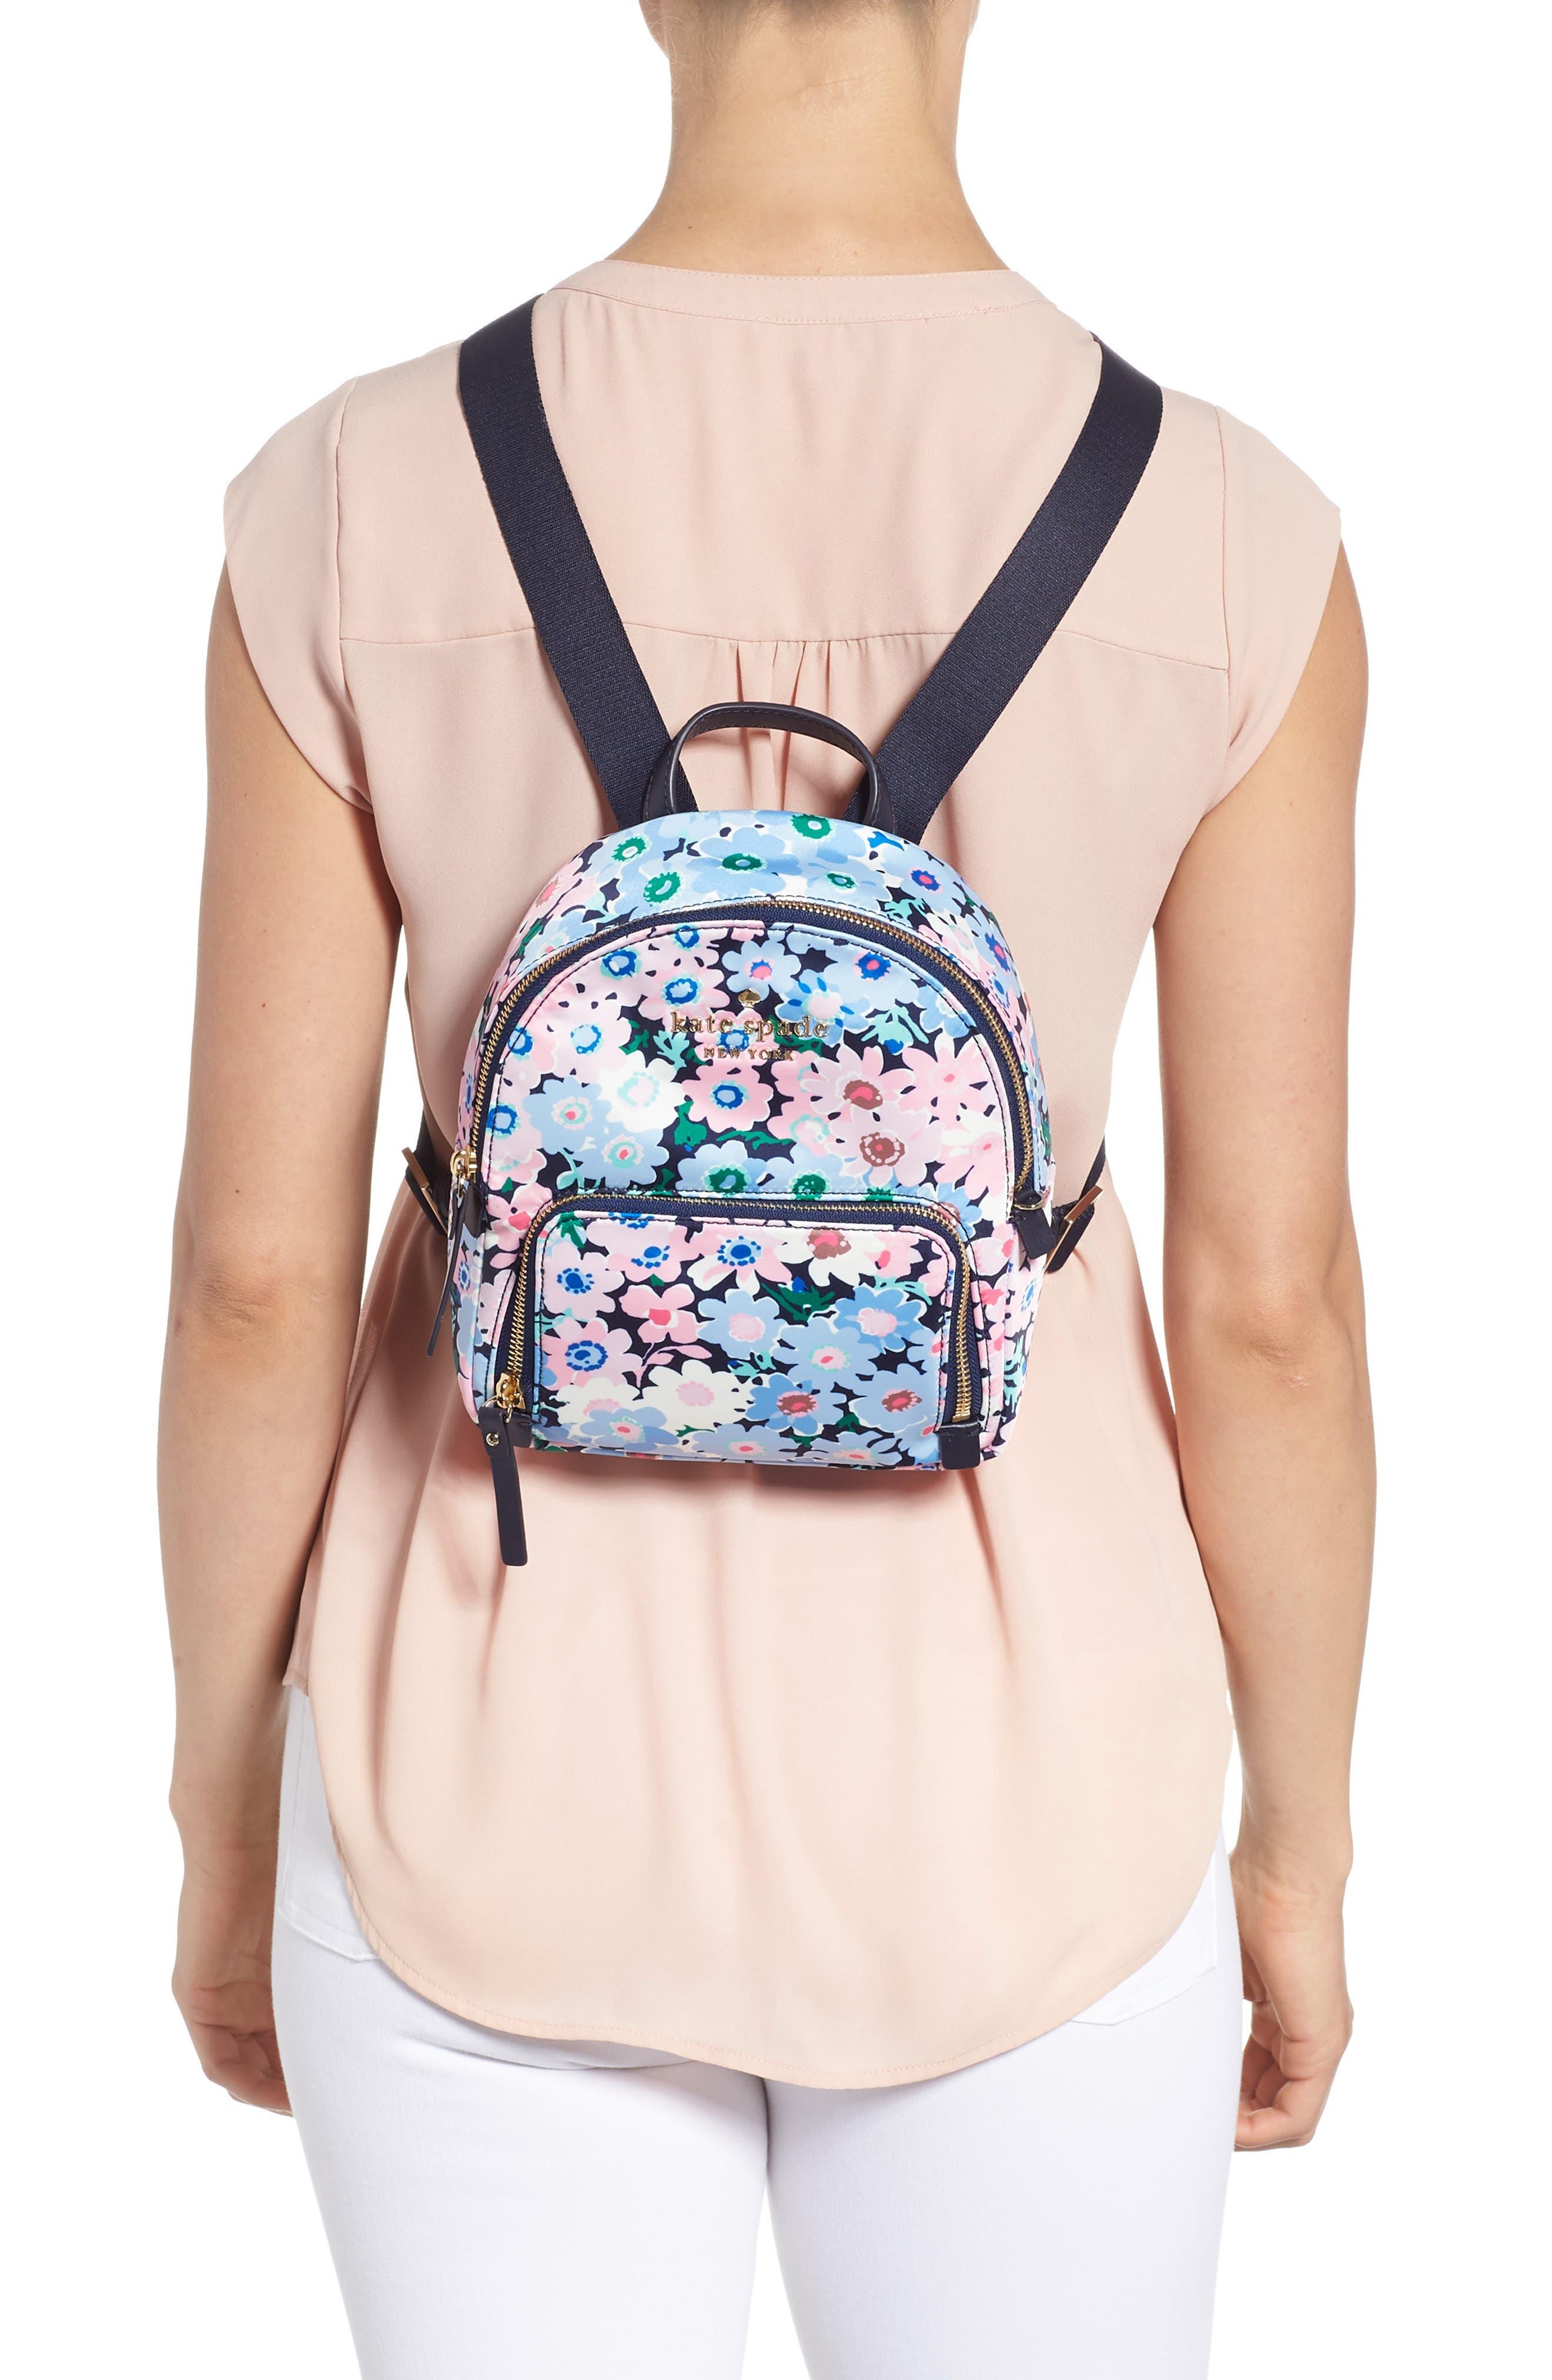 watson lane - daisy garden small hartley backpack,                             Alternate thumbnail 2, color,                             Blue Multi